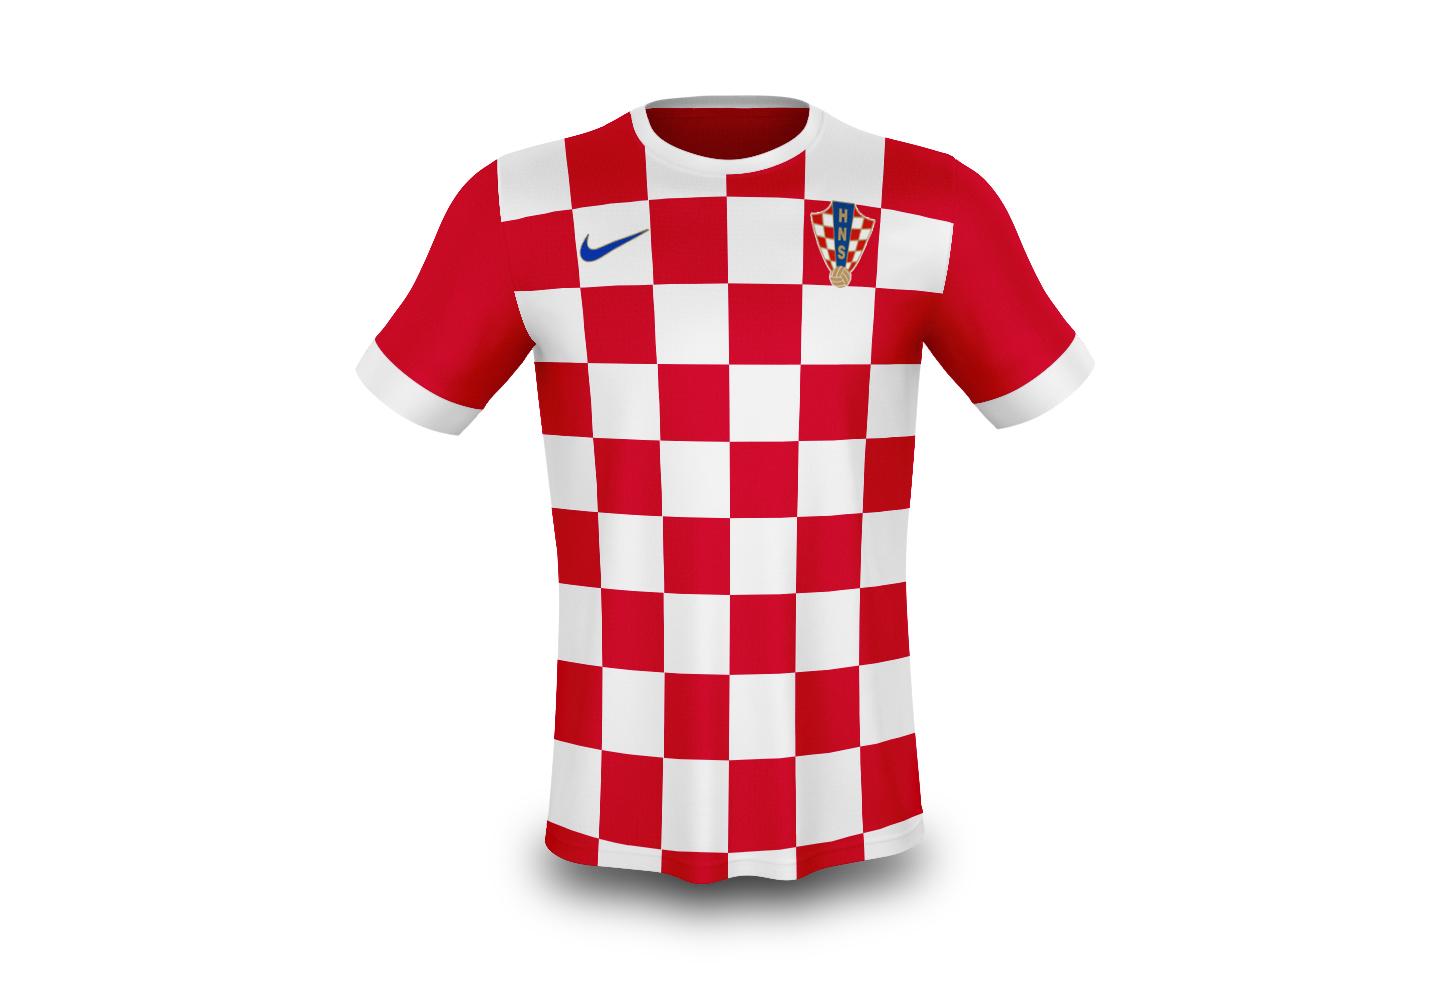 football t shirt mockup psd free